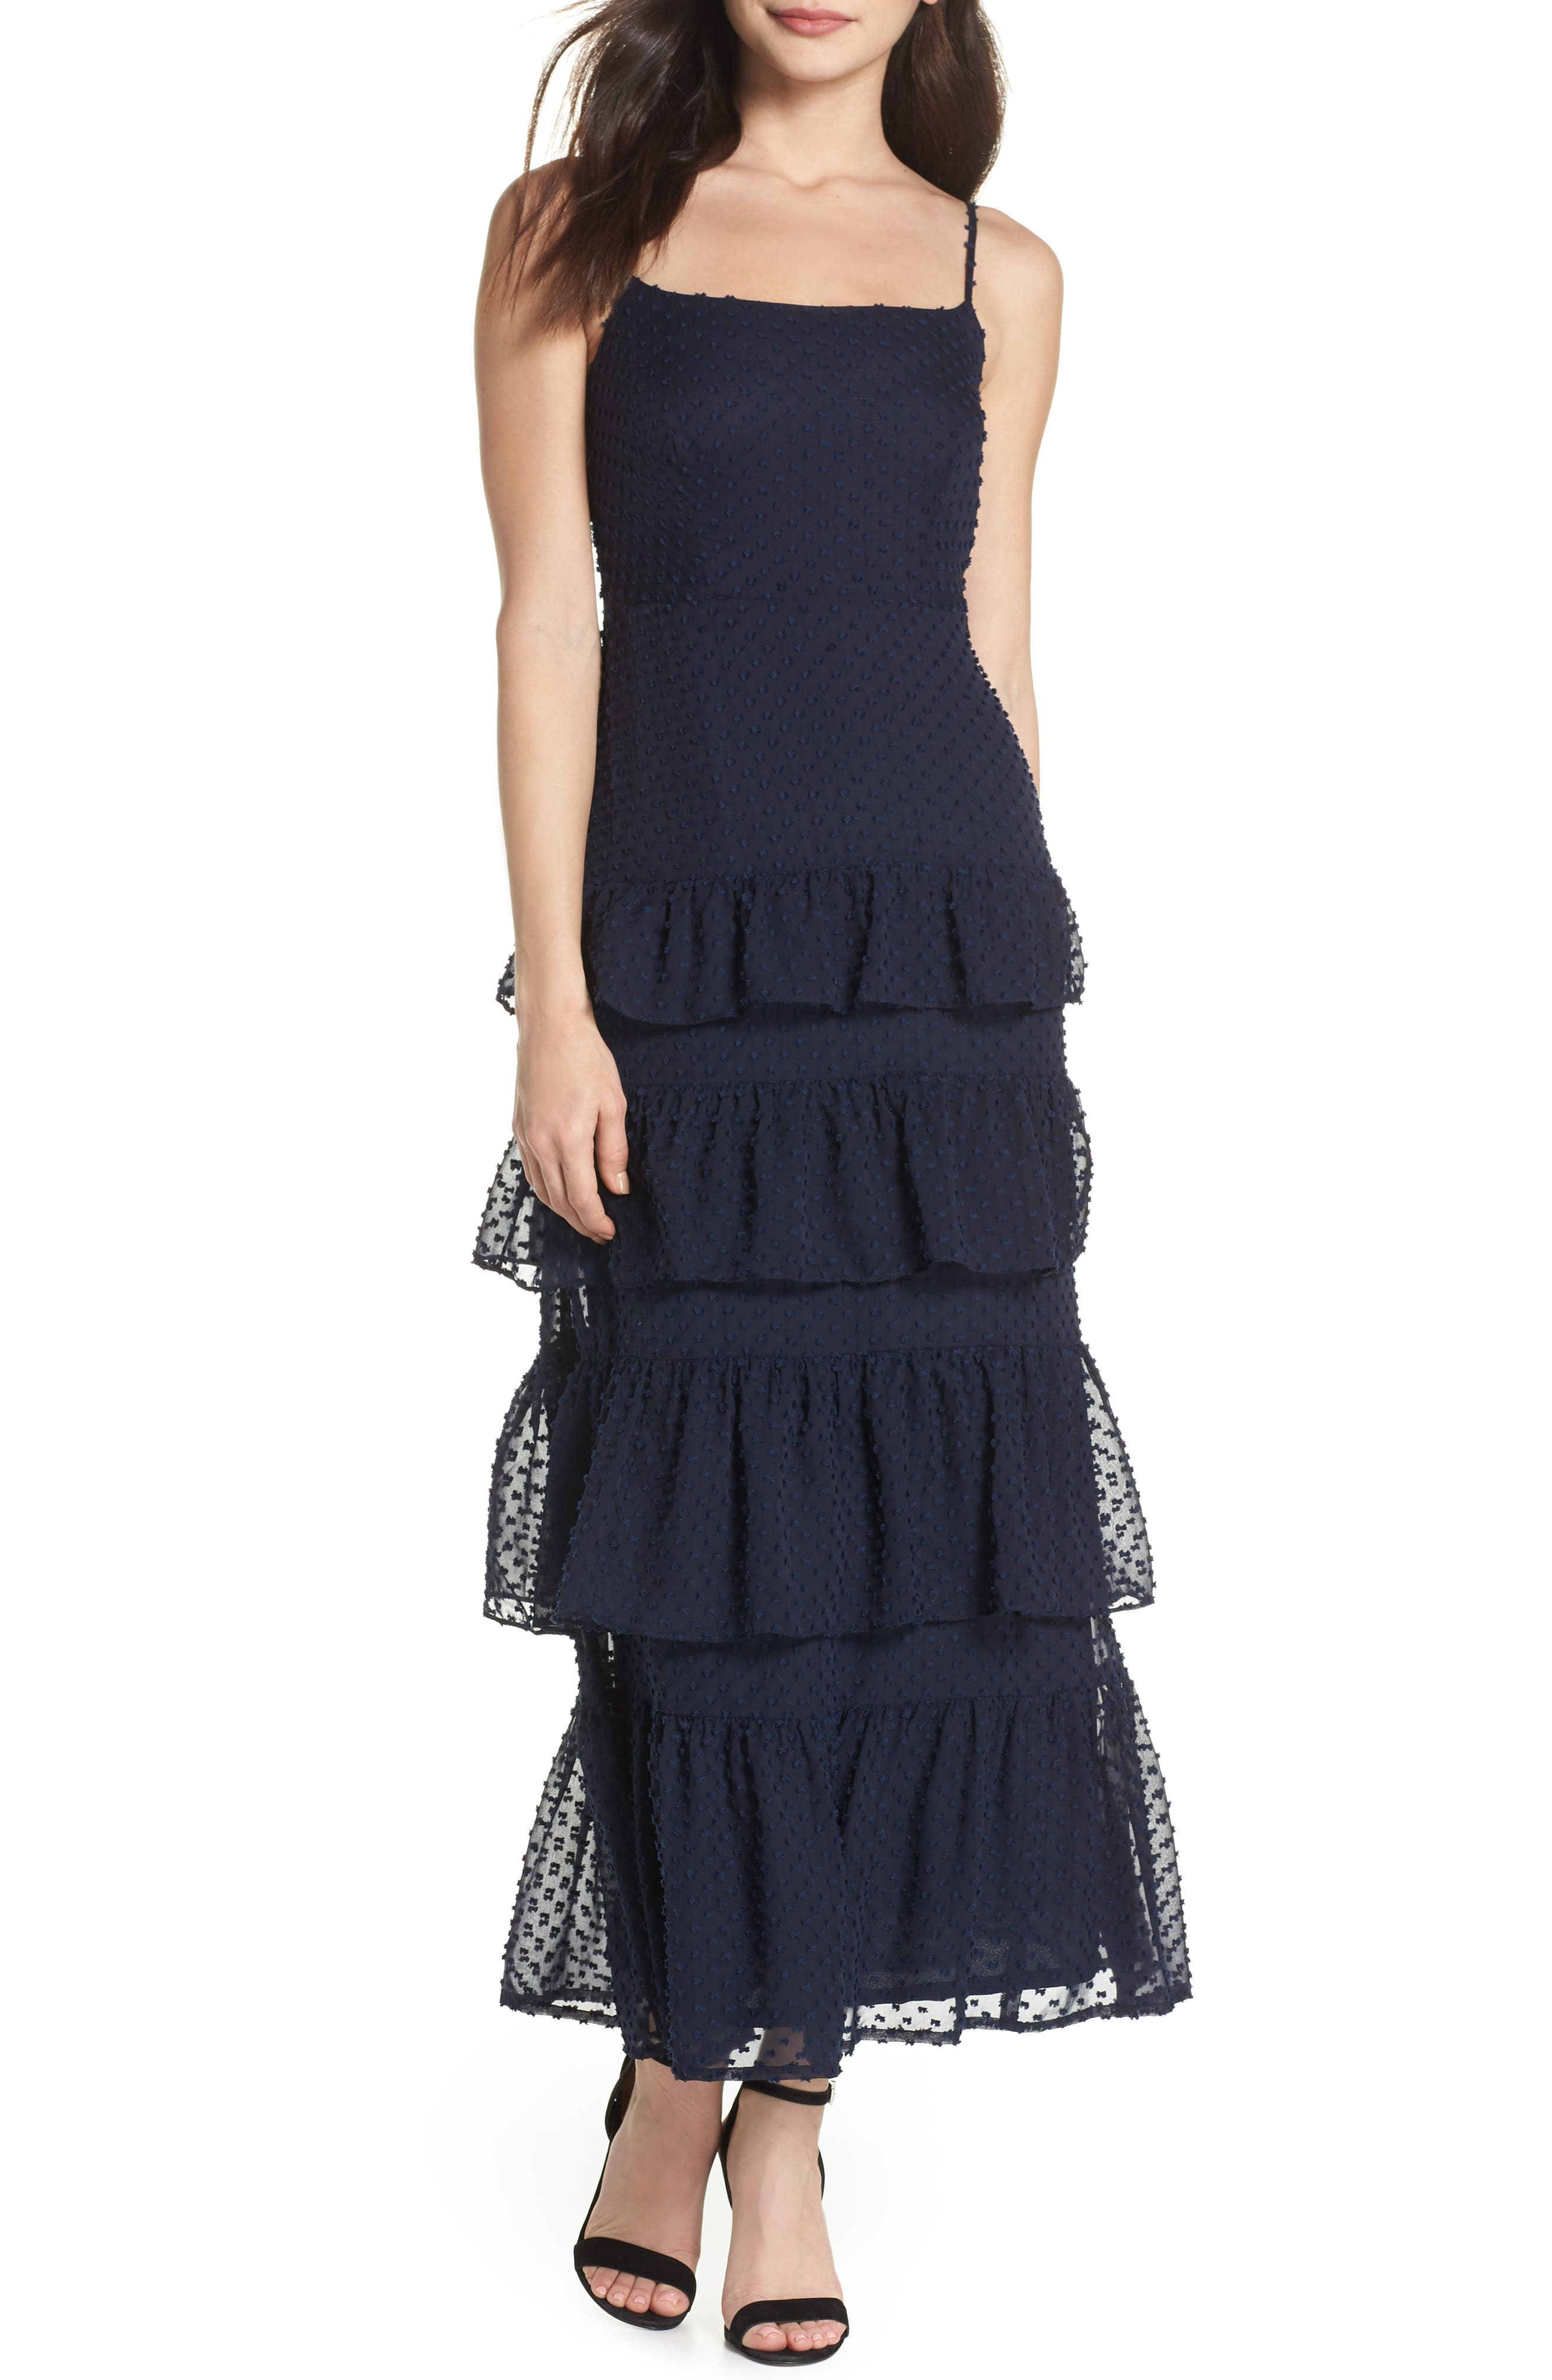 Main Image - J.Crew Dabble Dress (Nordstrom Exclusive)